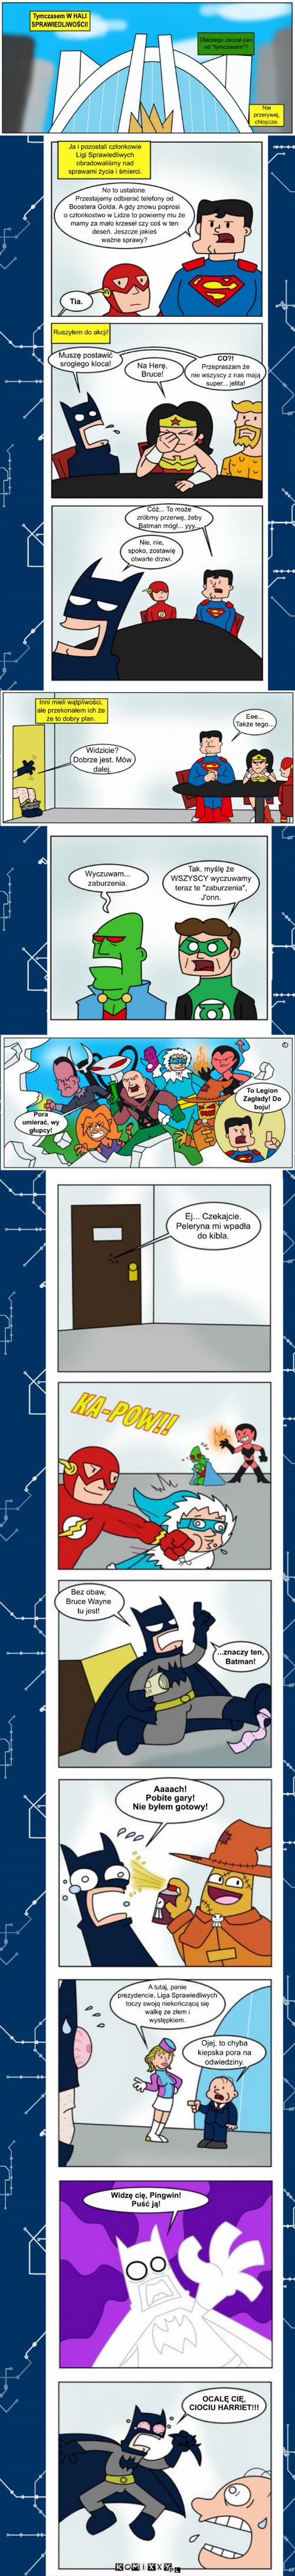 I Bat i bat tytani 18 komiks internetowy